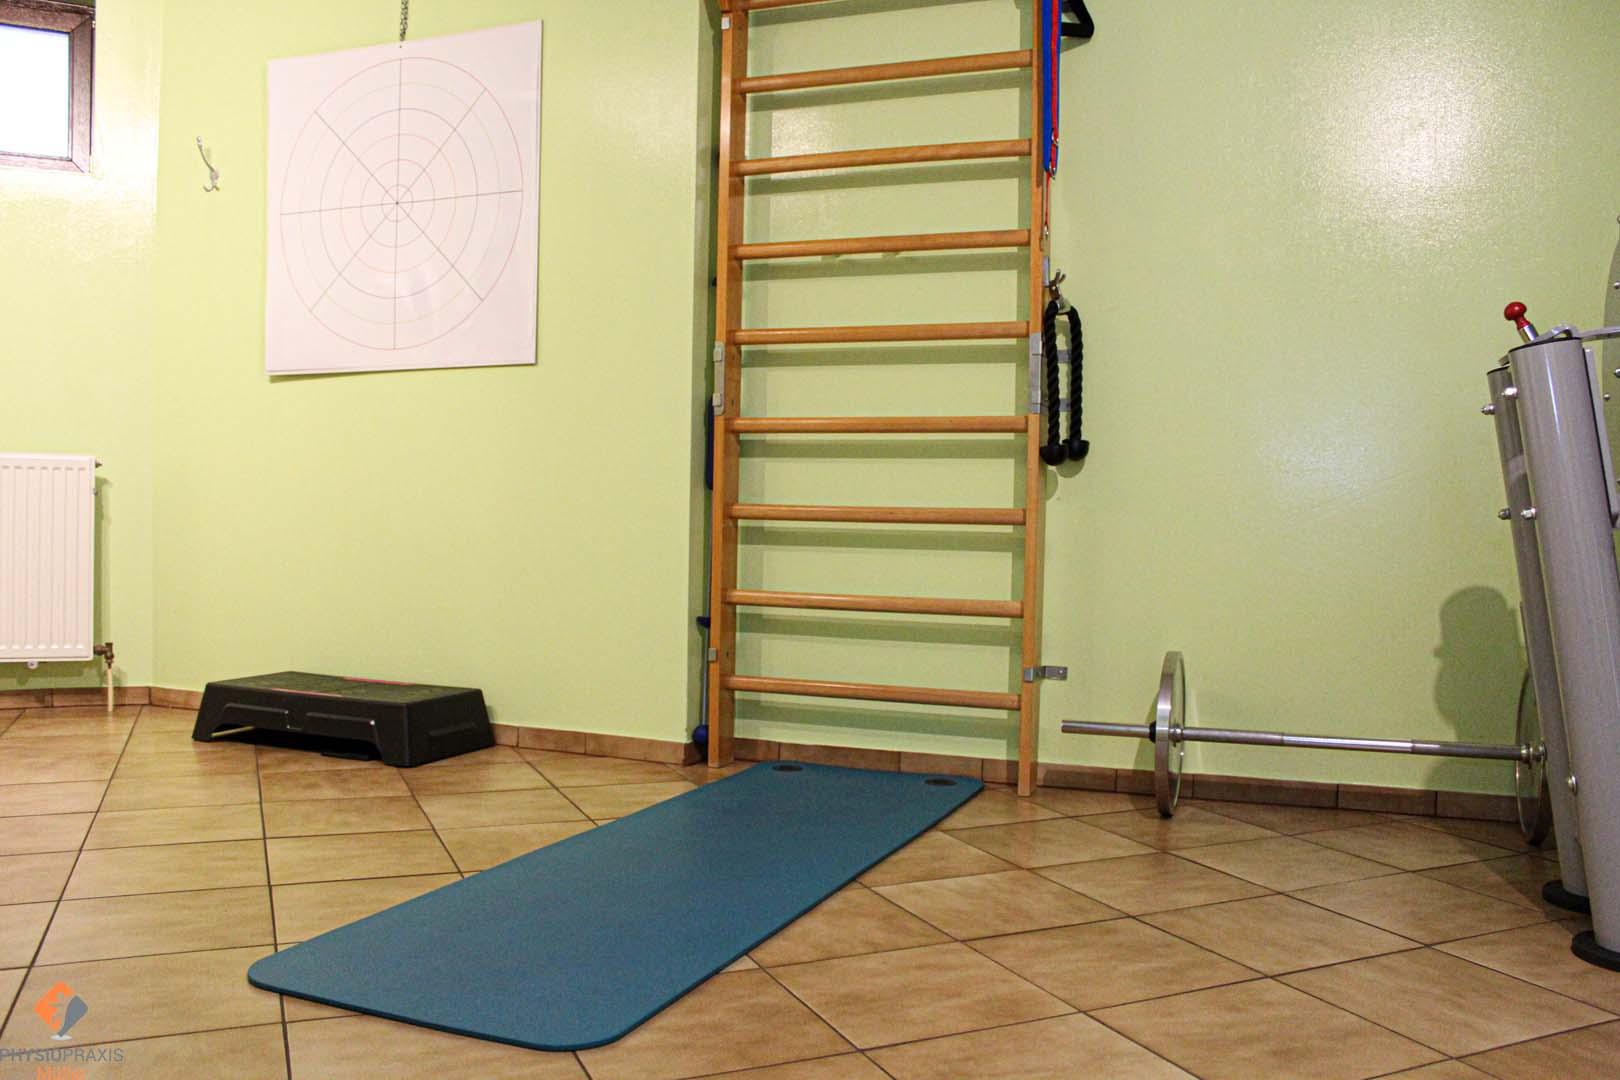 Trainingsraum - Koordinationstraining, Kraft und Ausdauer